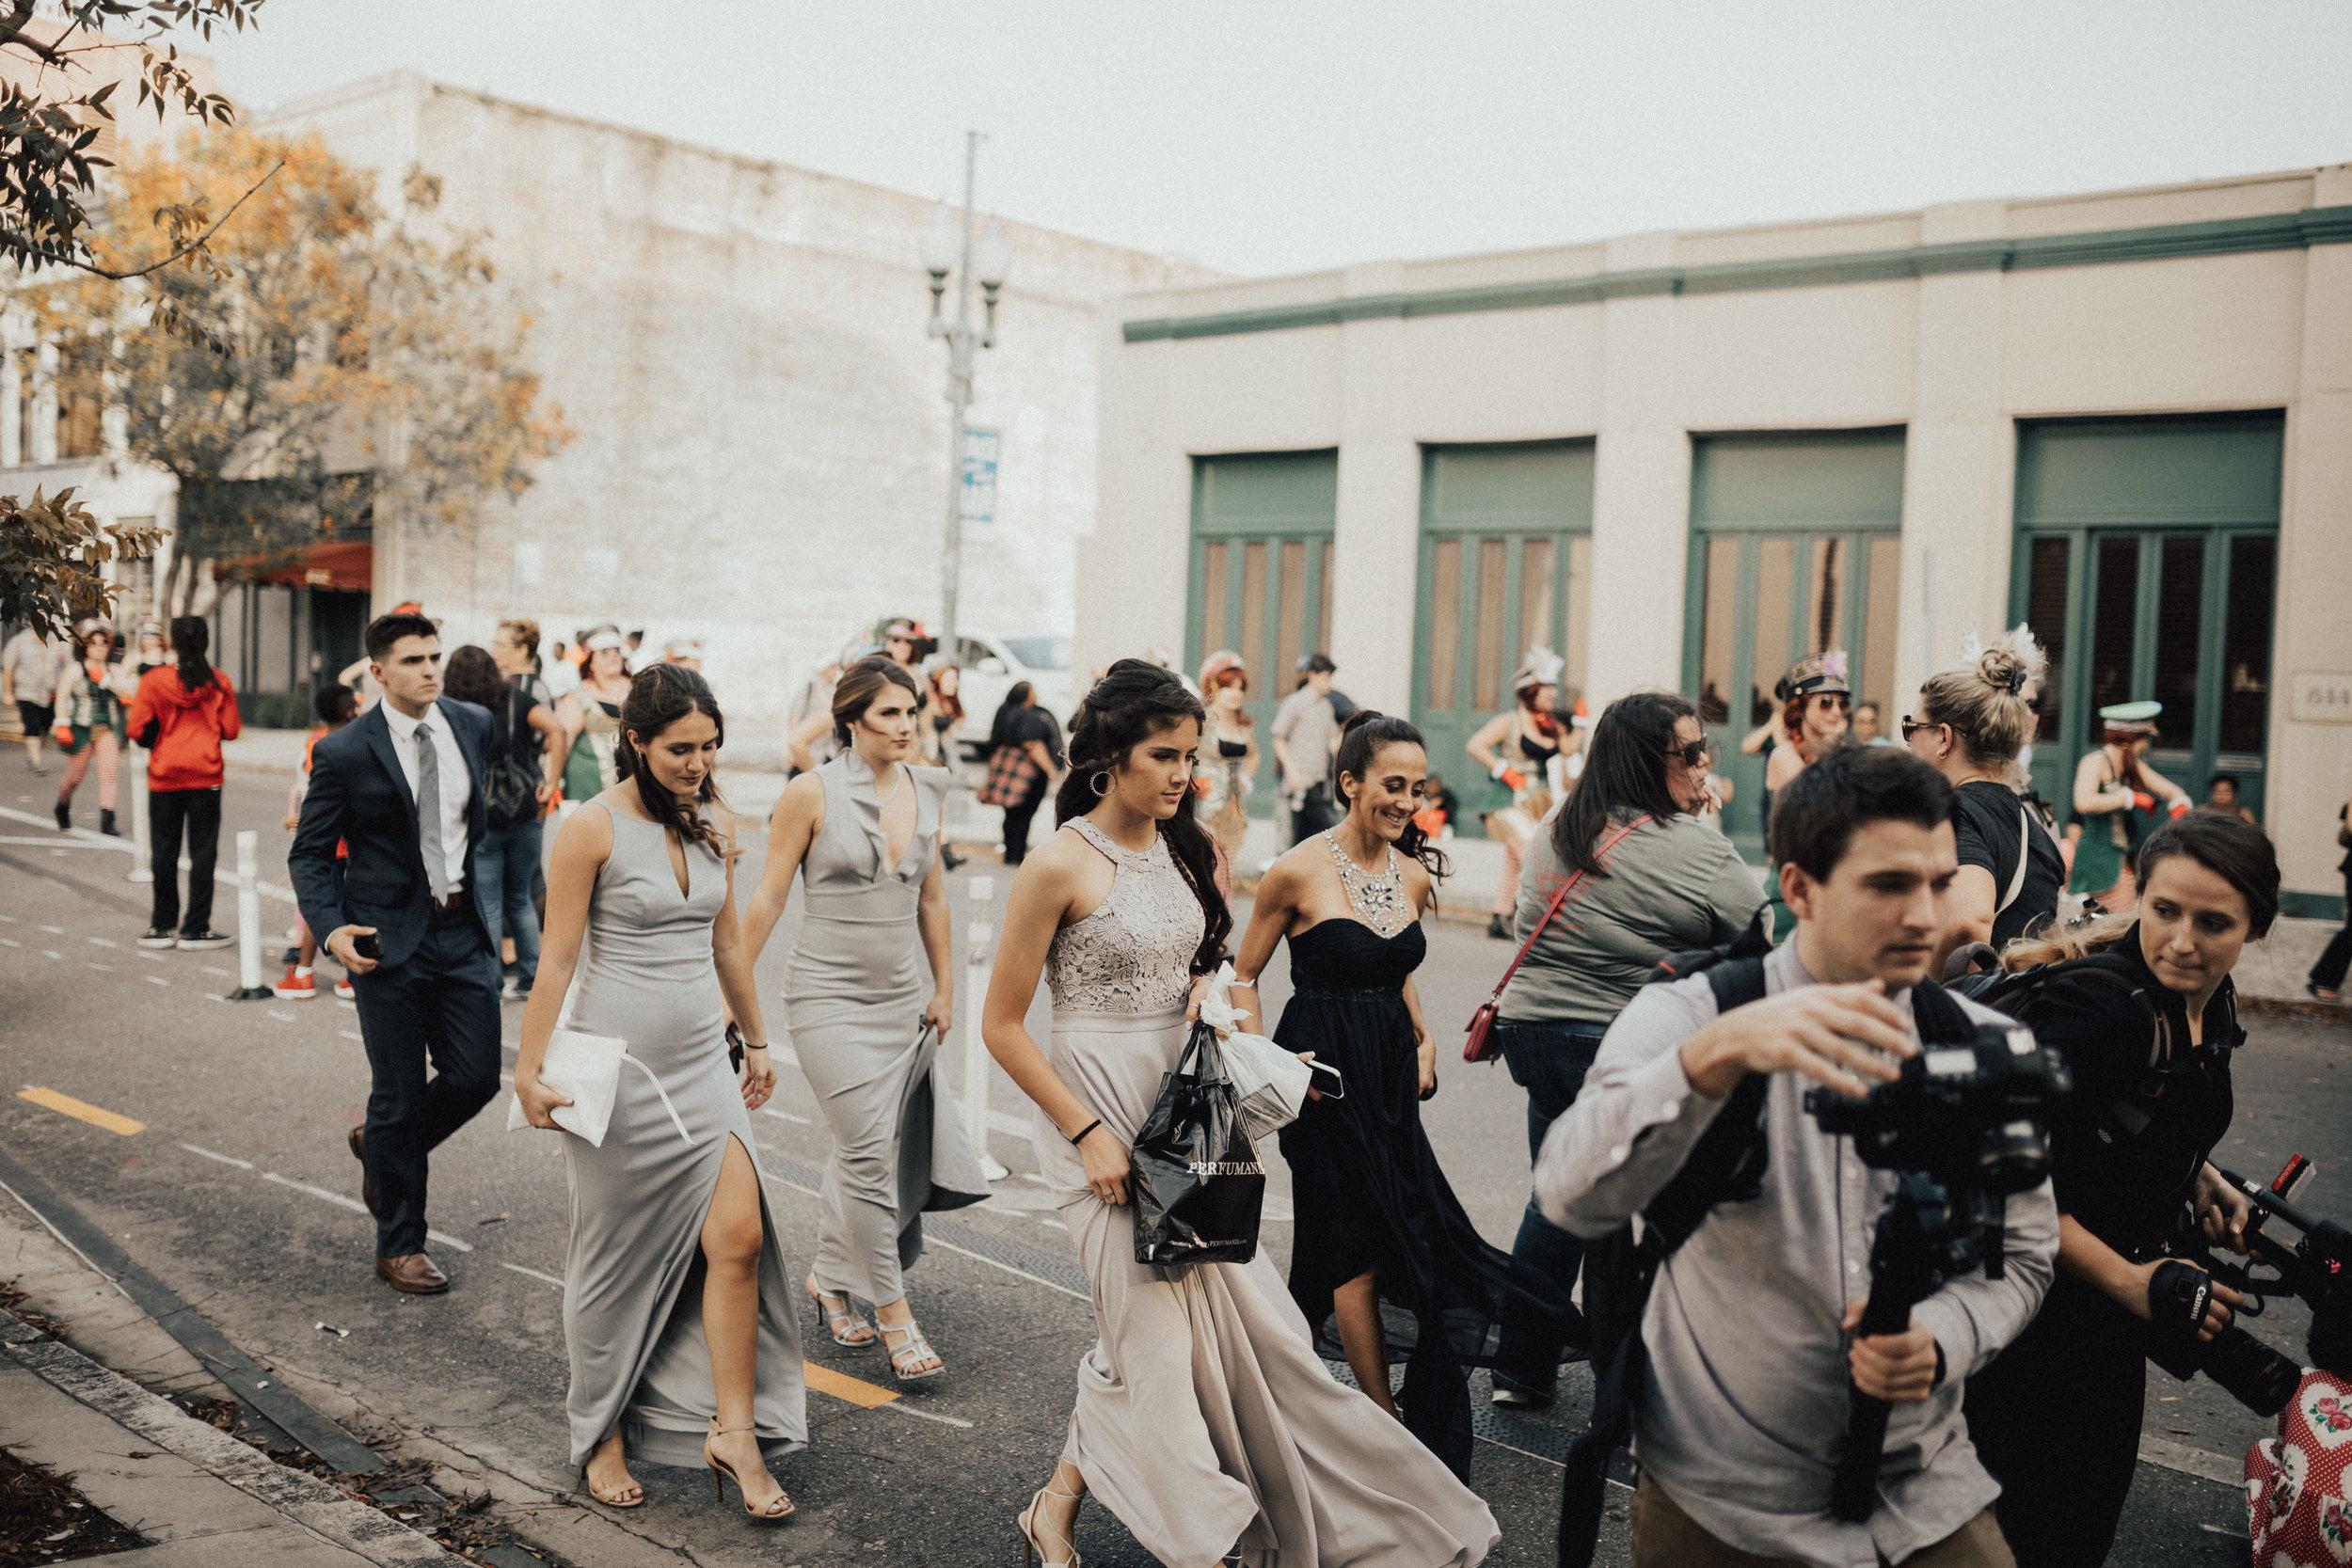 magners wedding (43 of 145).jpg